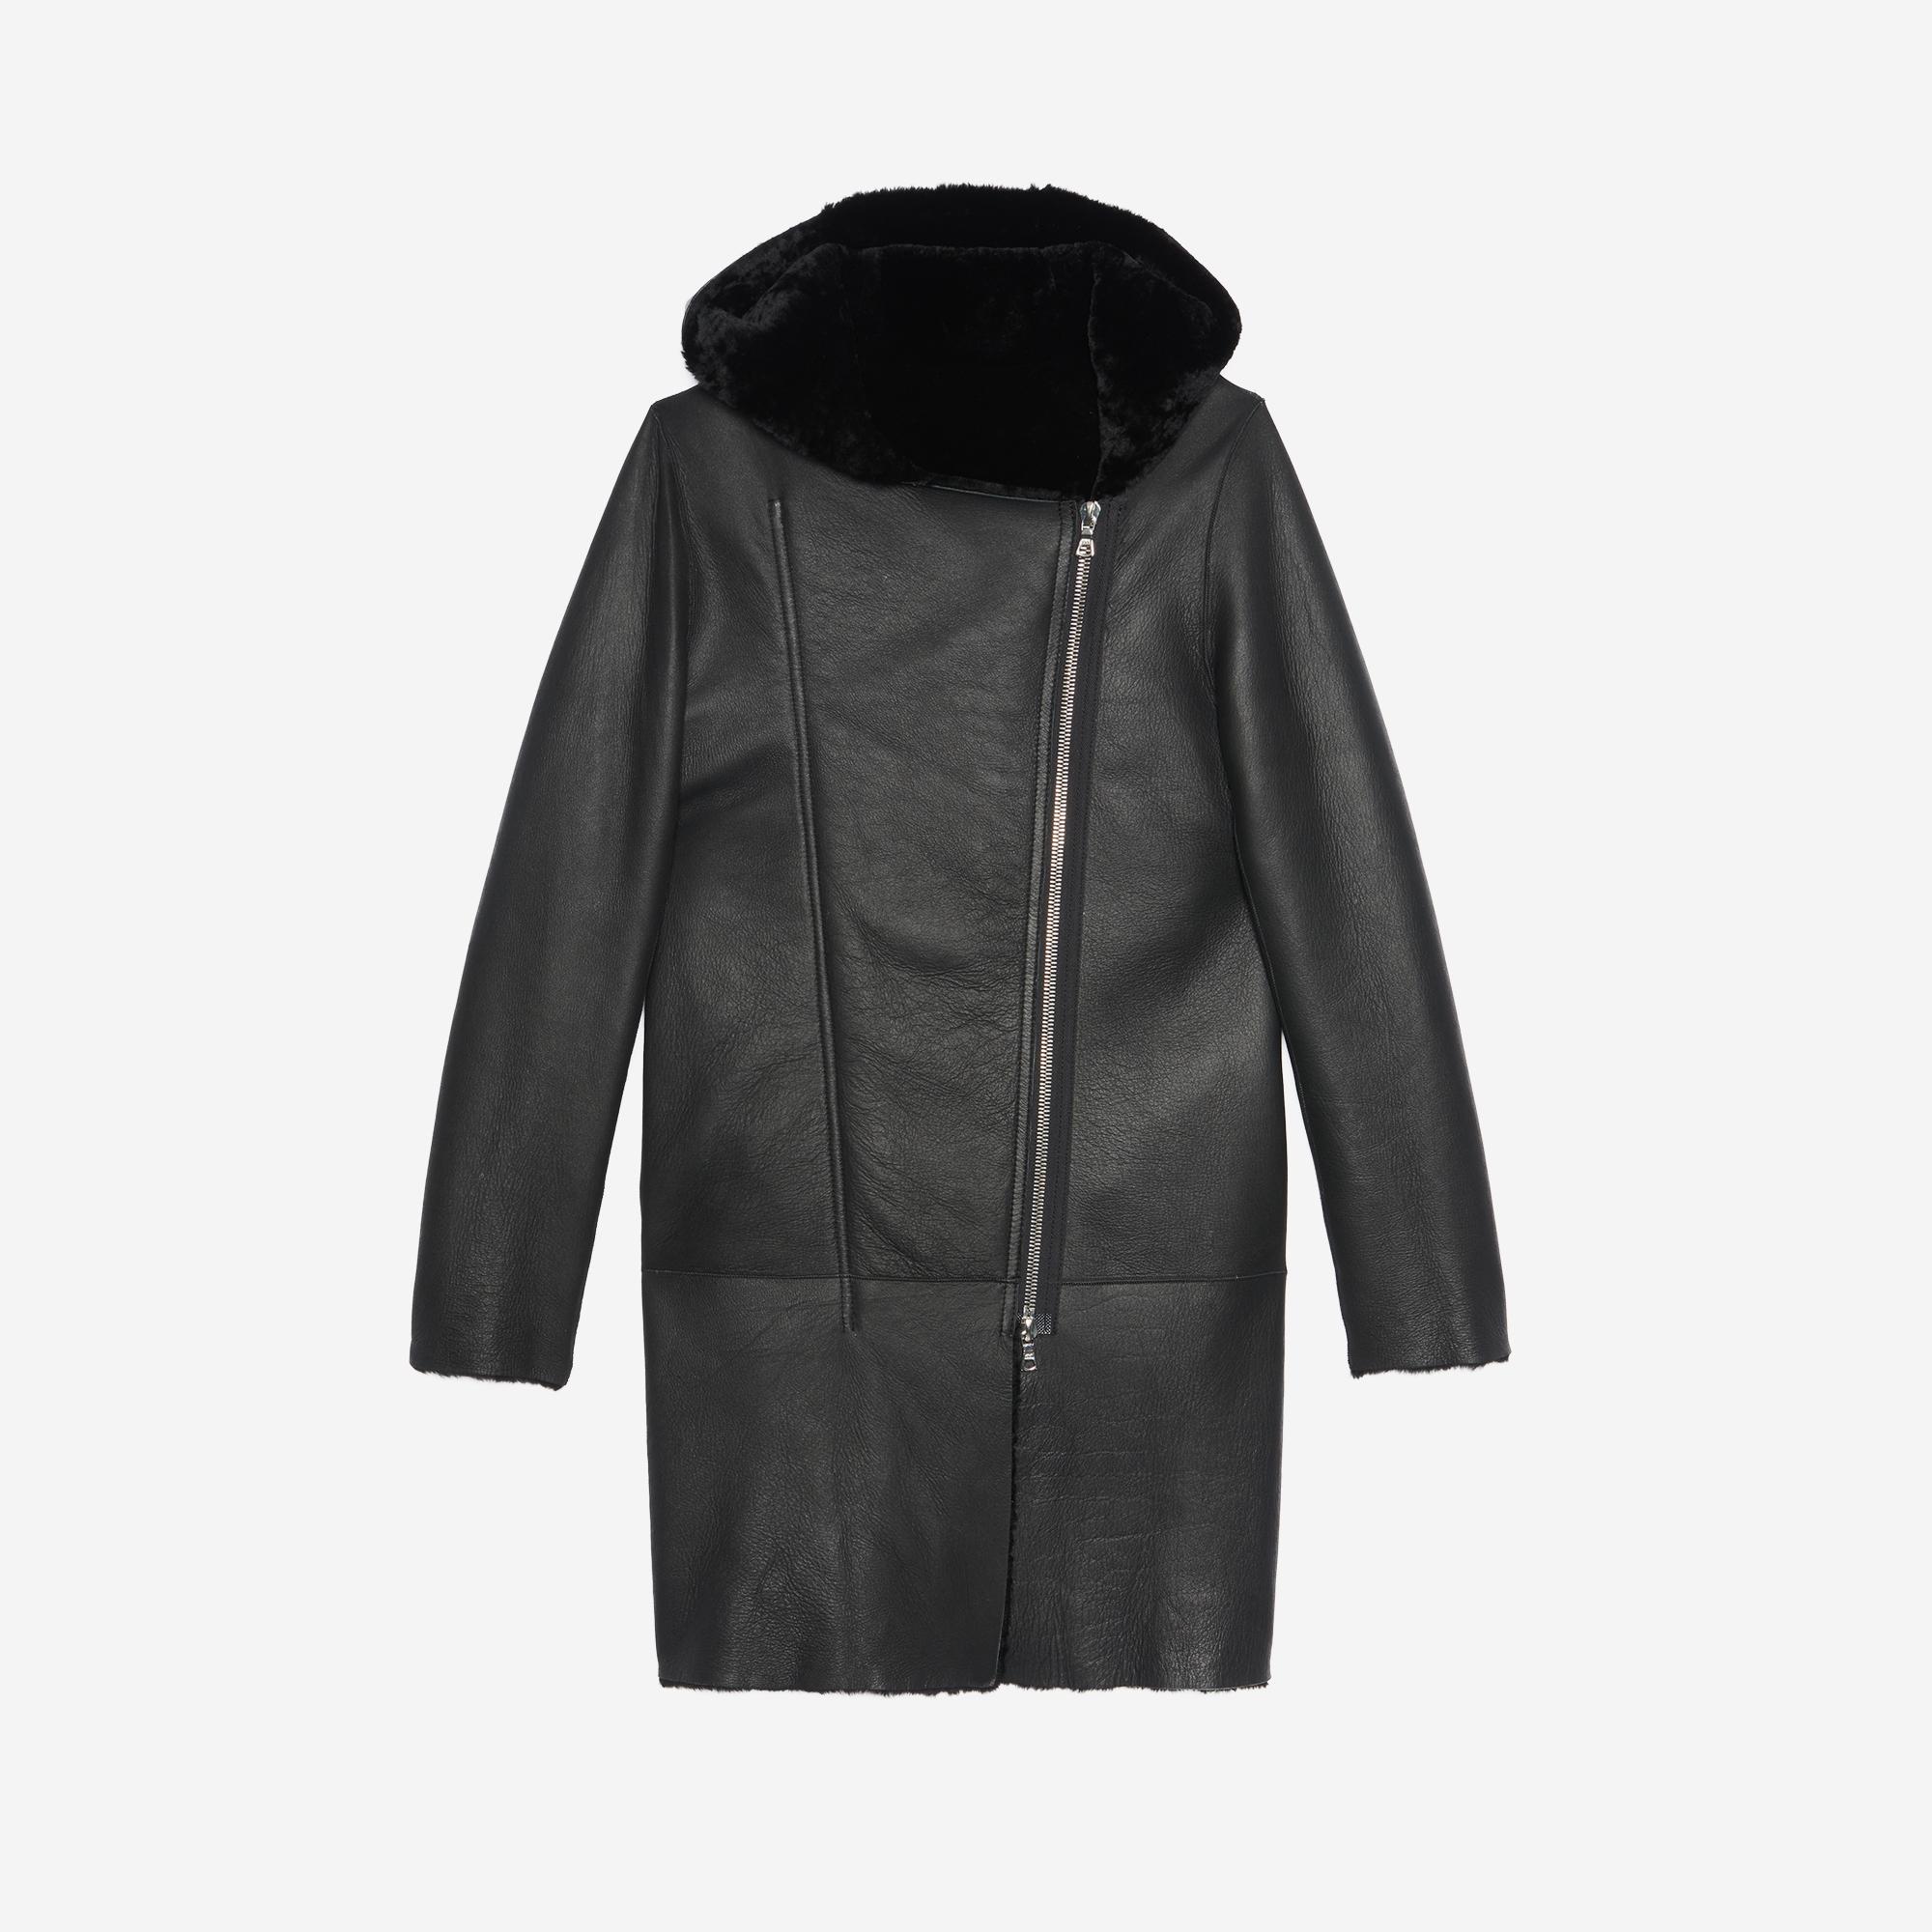 Sheepskin coat with hood - Coats - Sandro-paris.com